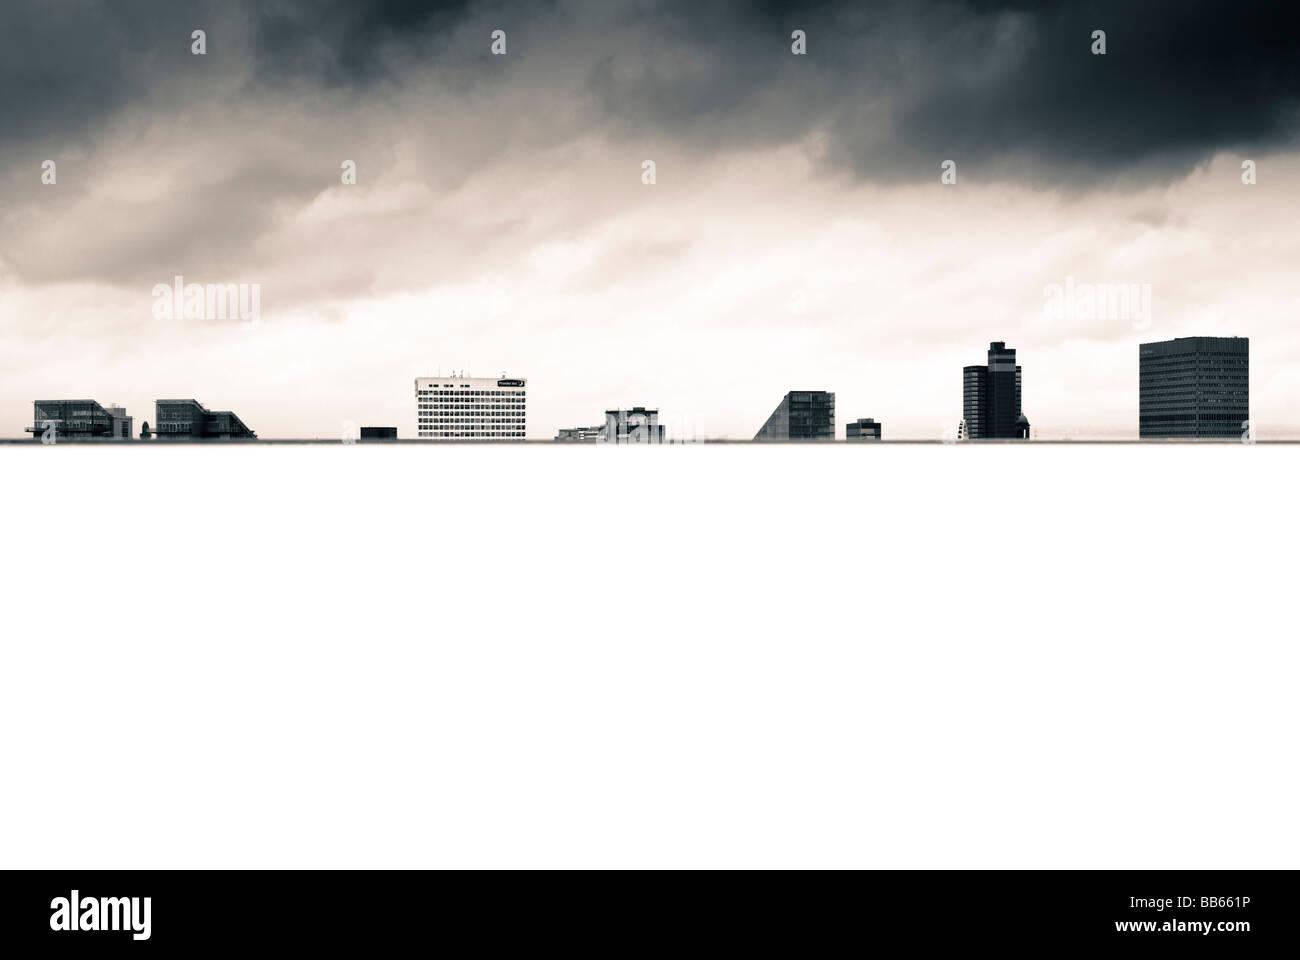 Skyline of Manchester City Centre, UK, with a stormy sky - Stock Image